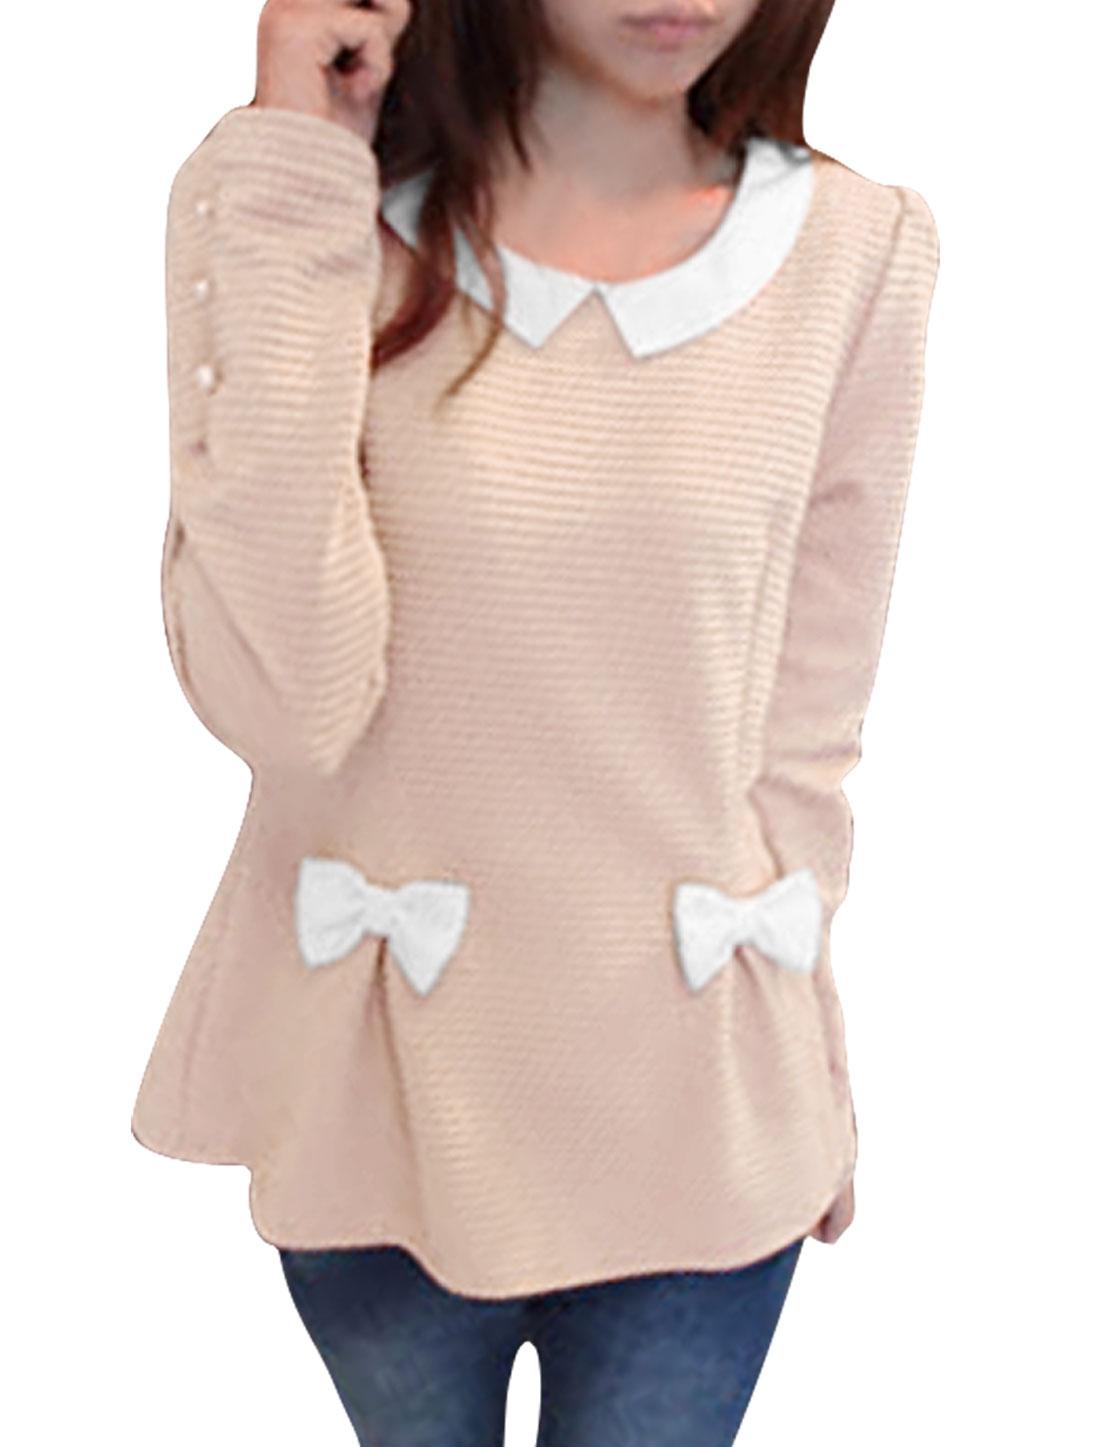 Women Long Sleeves Bowknot Decor Texture Light Pink Blouse Top XS